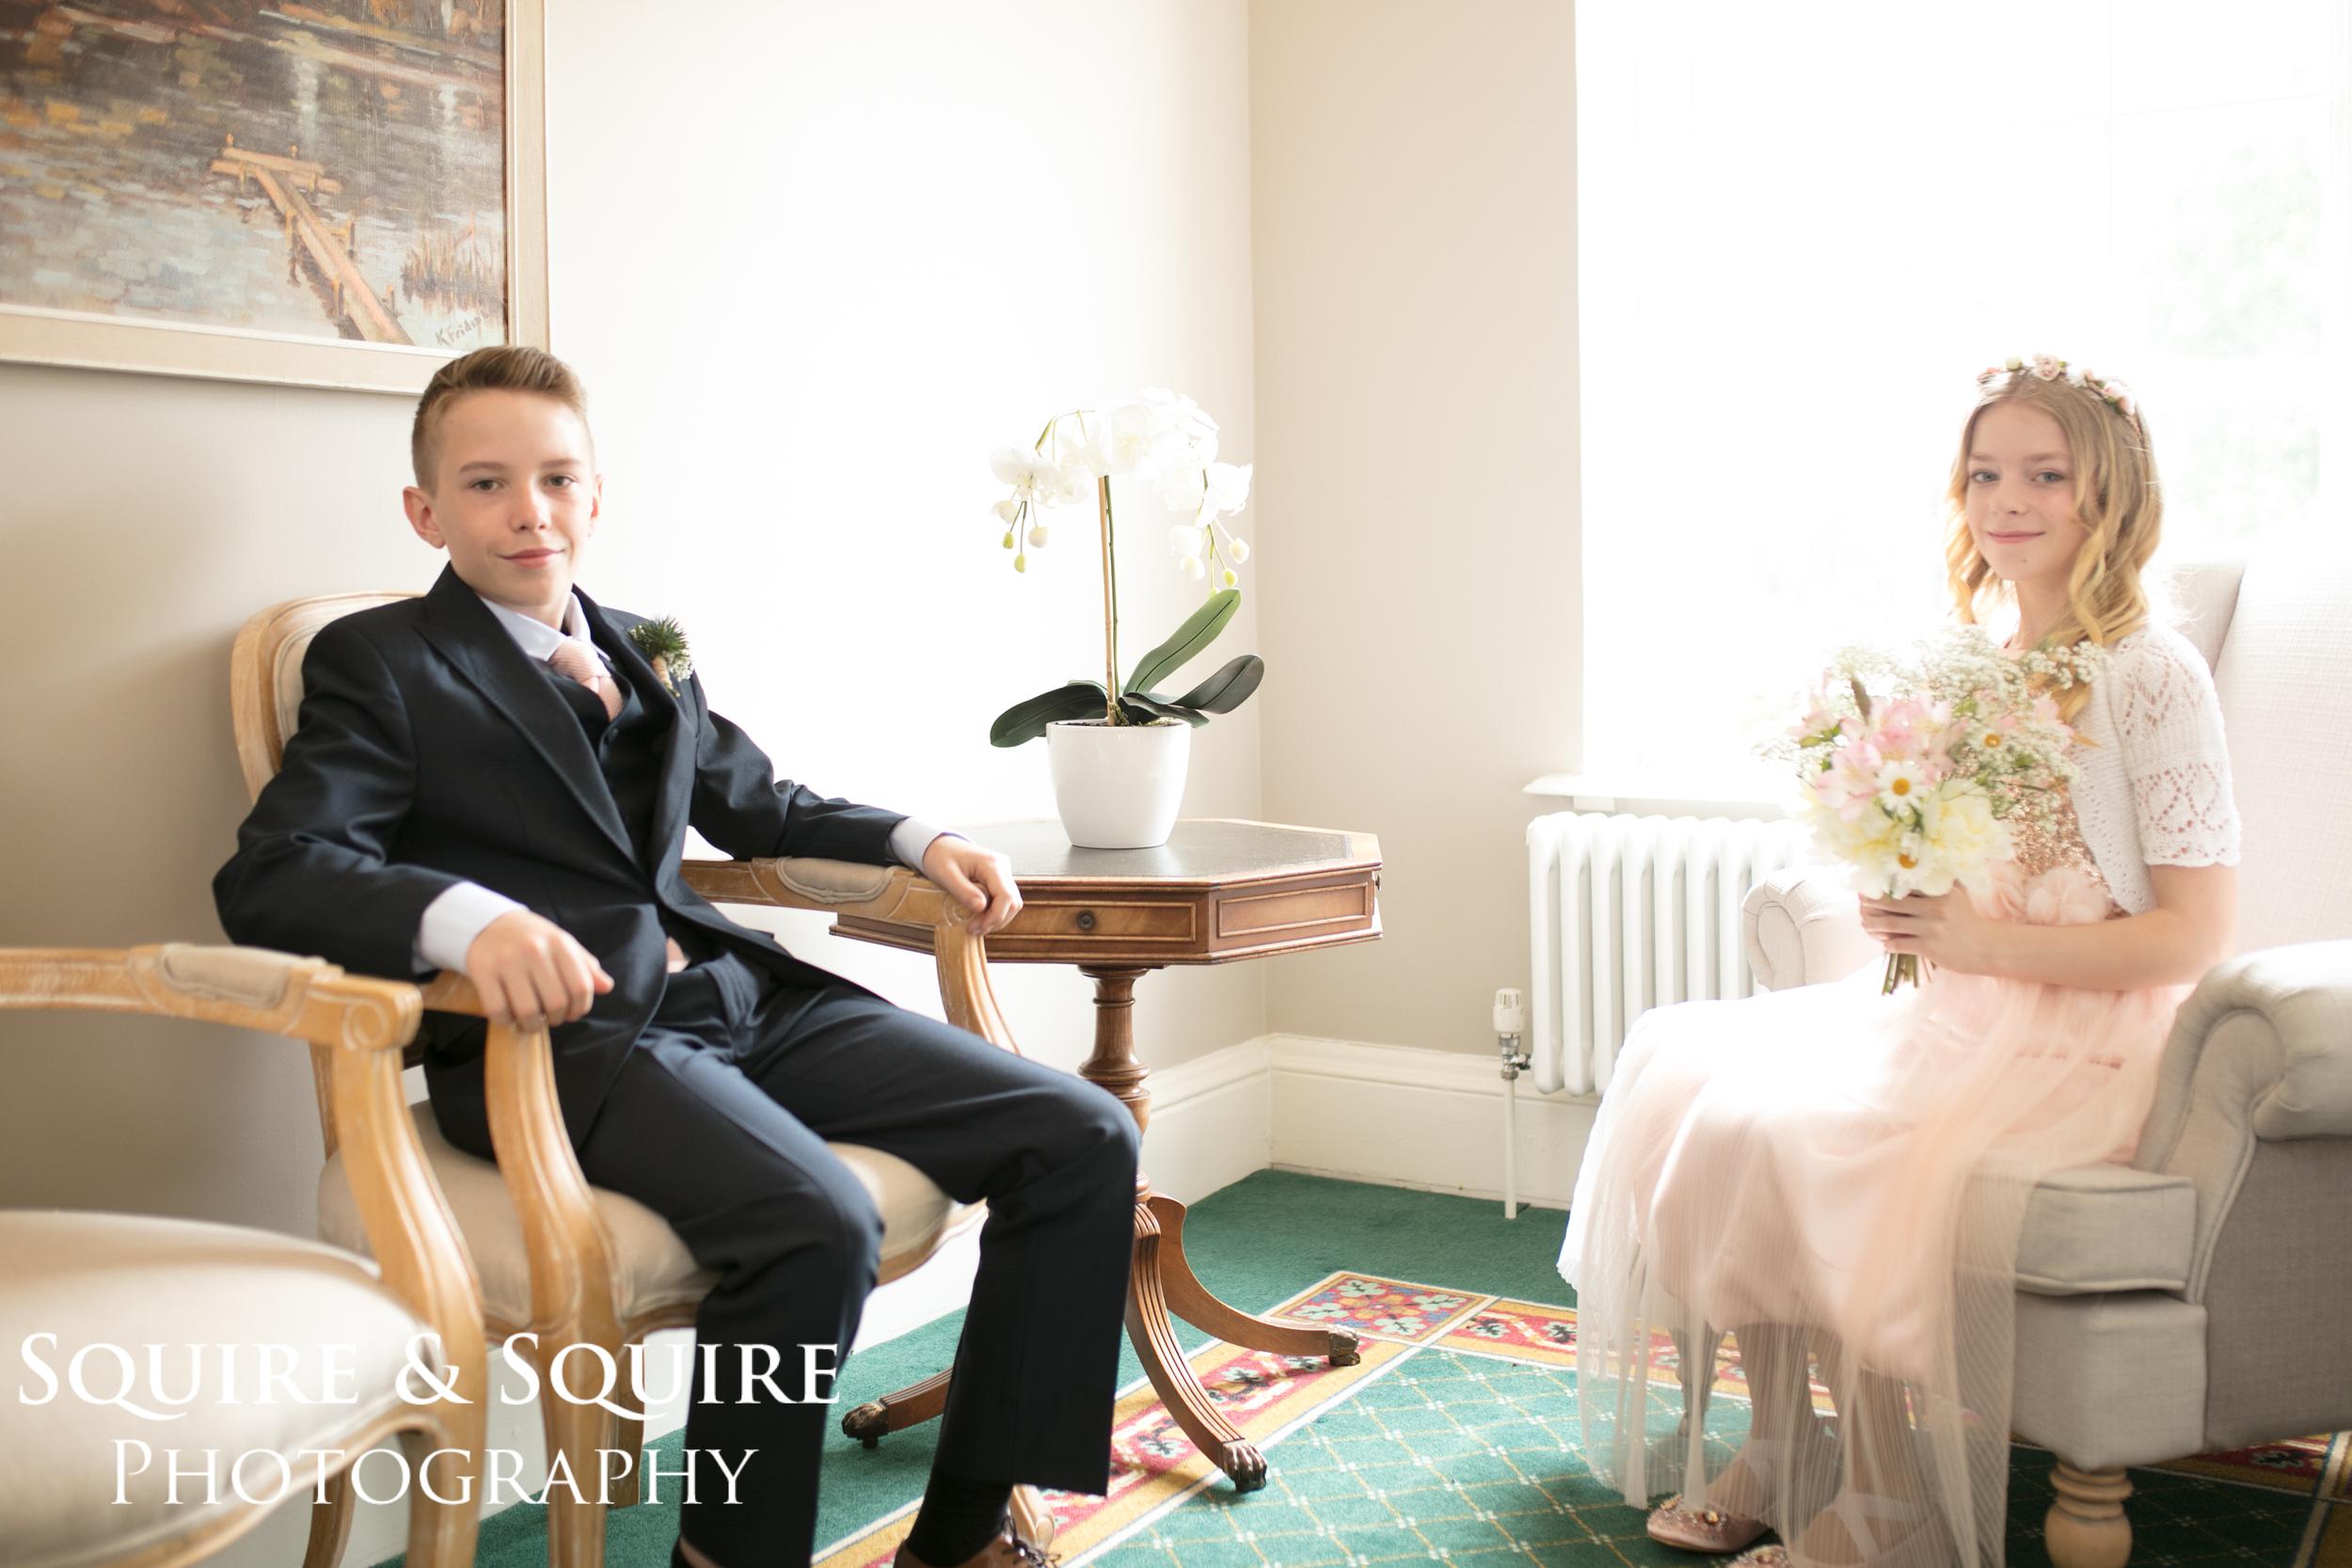 wedding_photography_catthorpe Manor (18 of 66).jpg